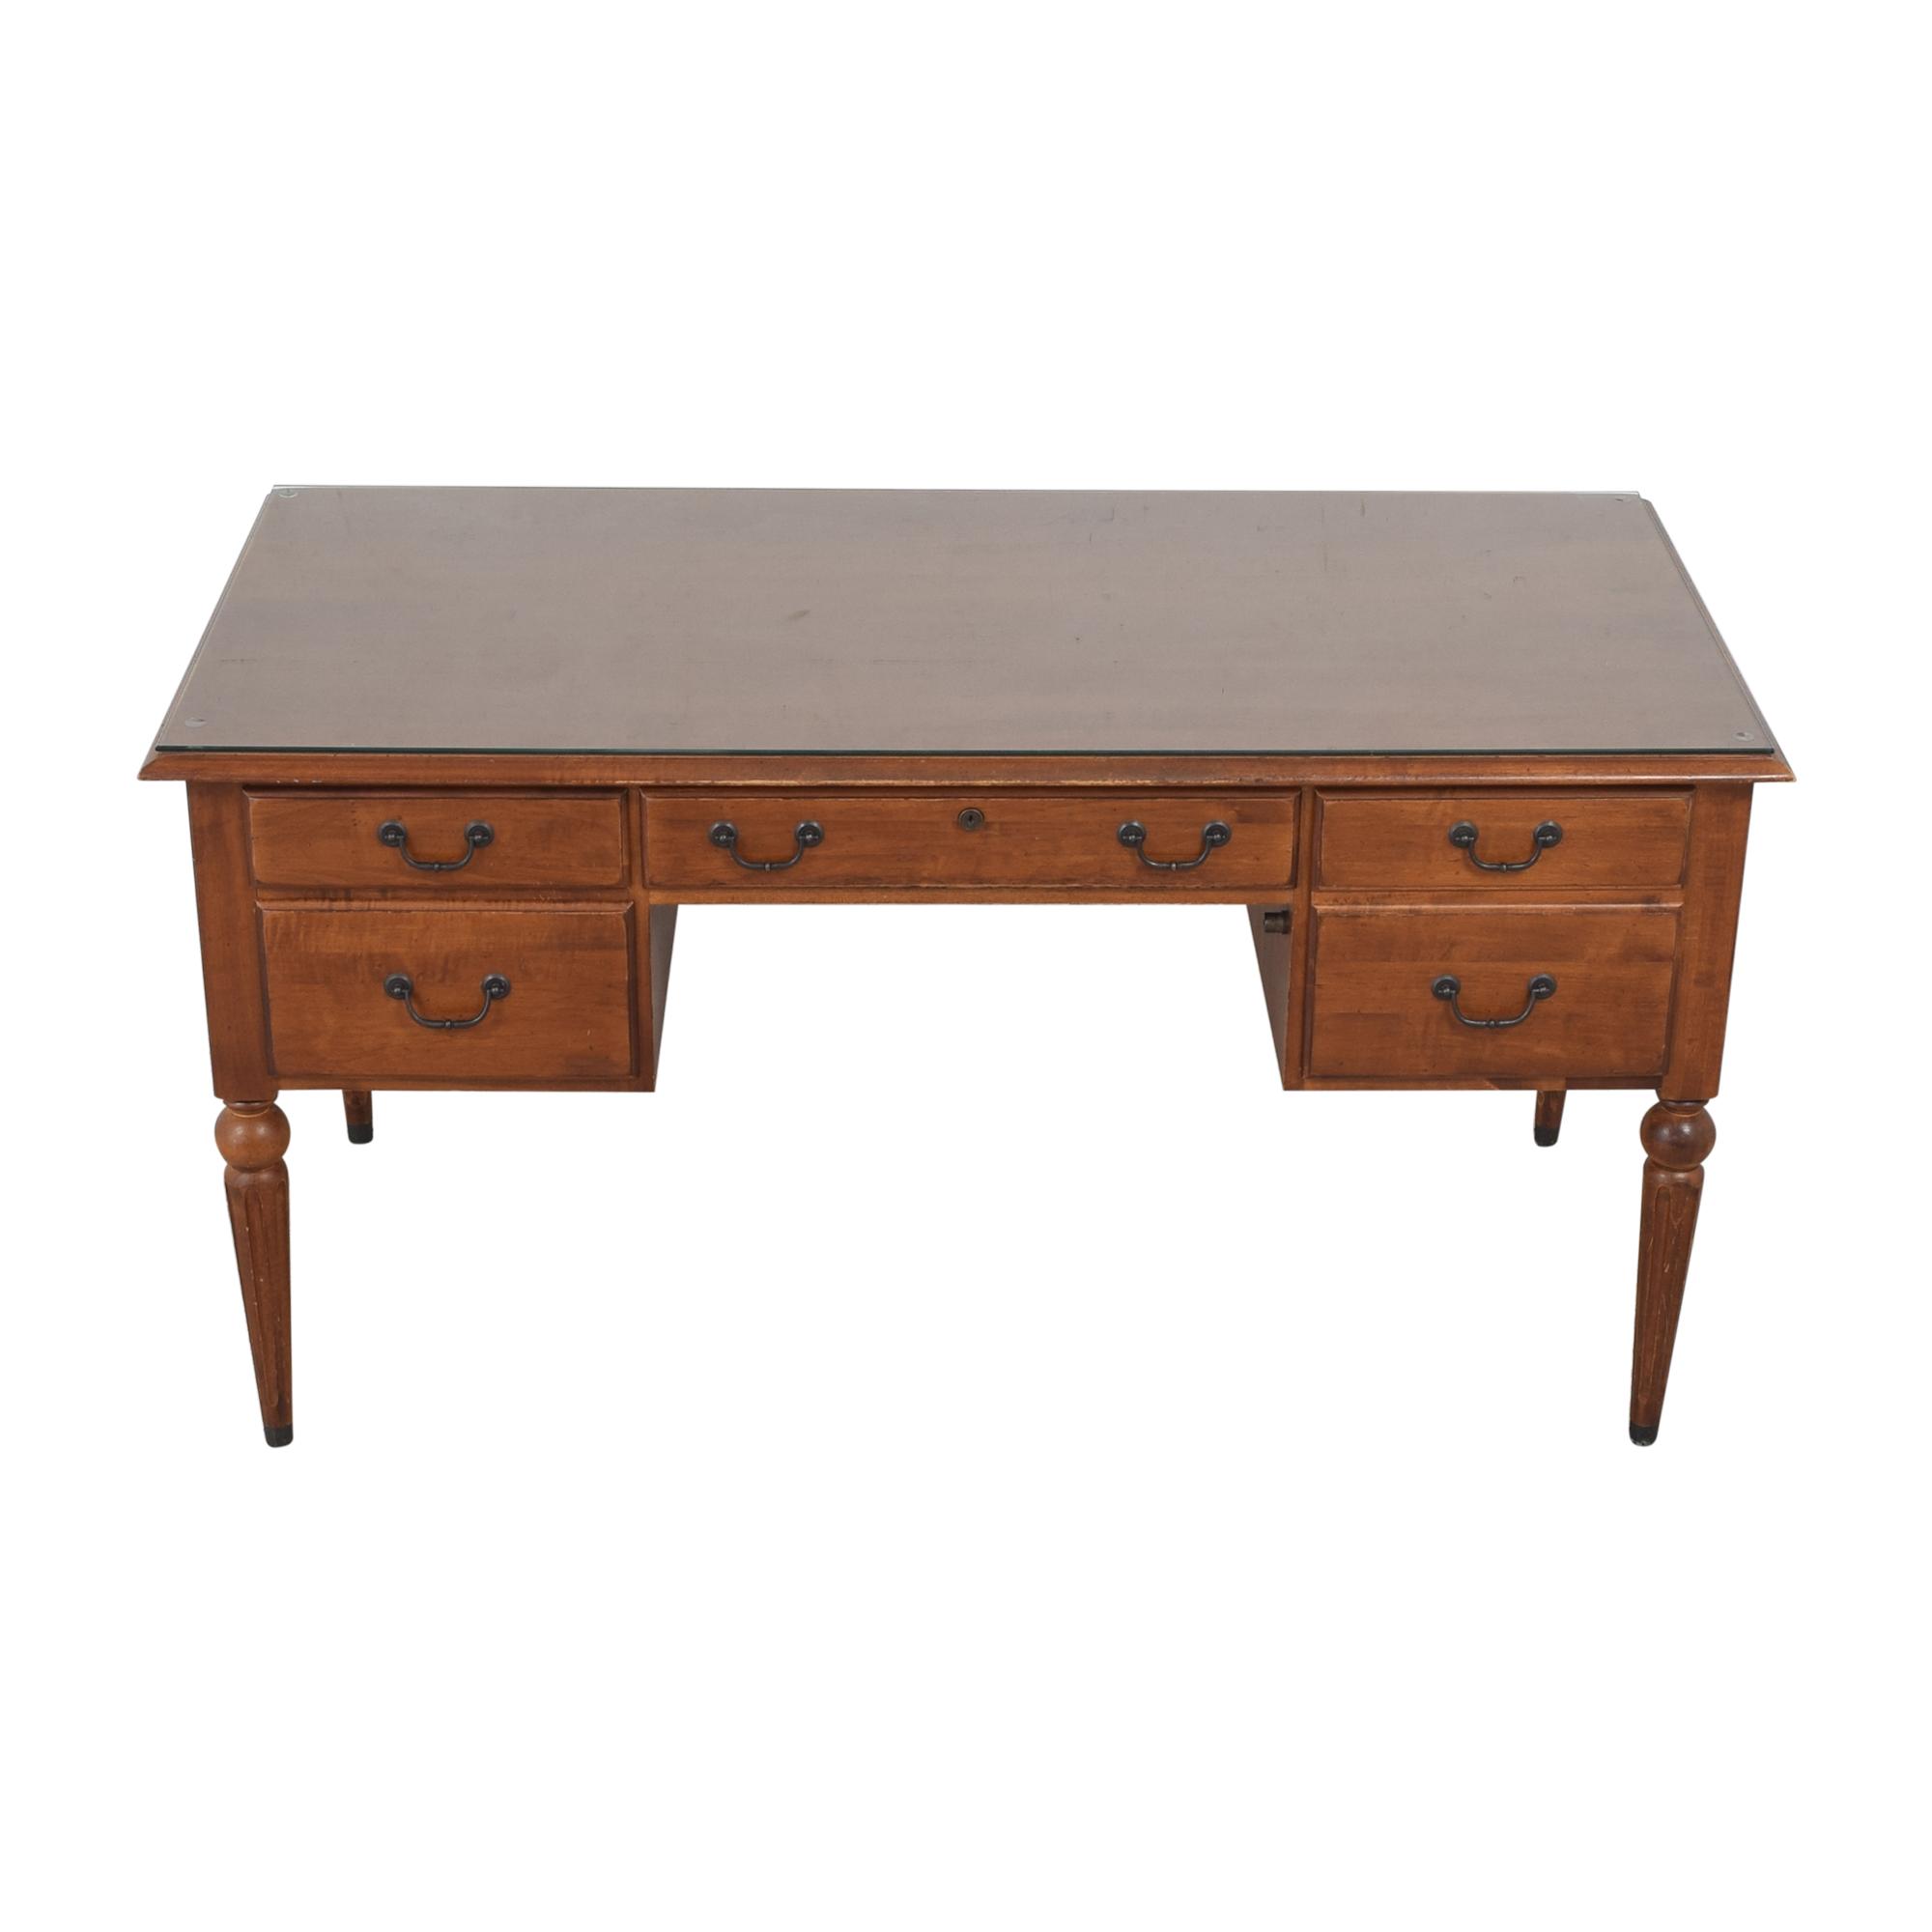 Ethan Allen Ethan Allen Country Crossings Writing Desk brown